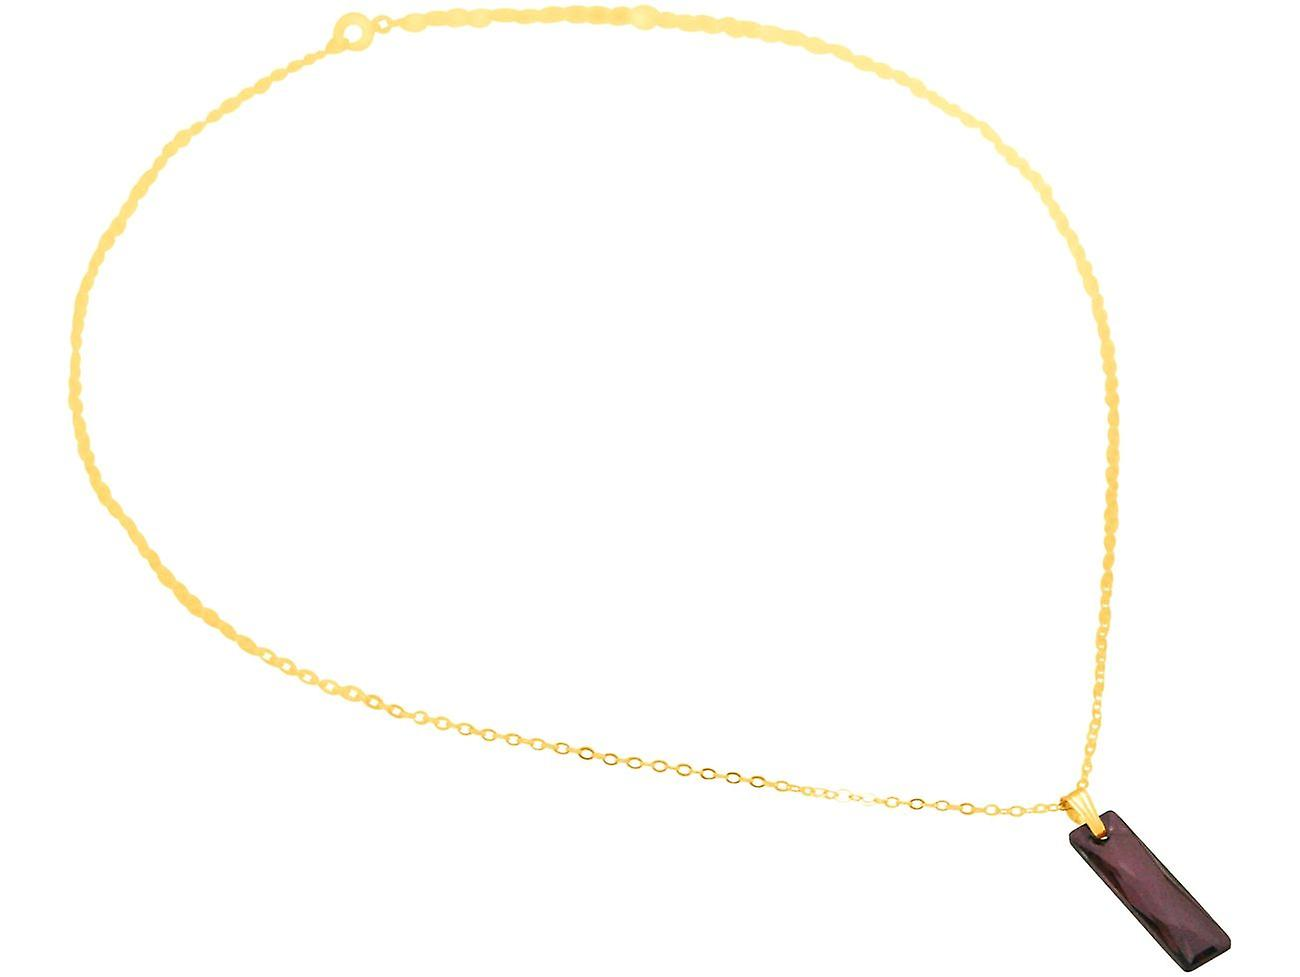 Gemshine Kette Amethyst Anhänger 925 Silber oder vergoldet SWAROVSKI ELEMENTS